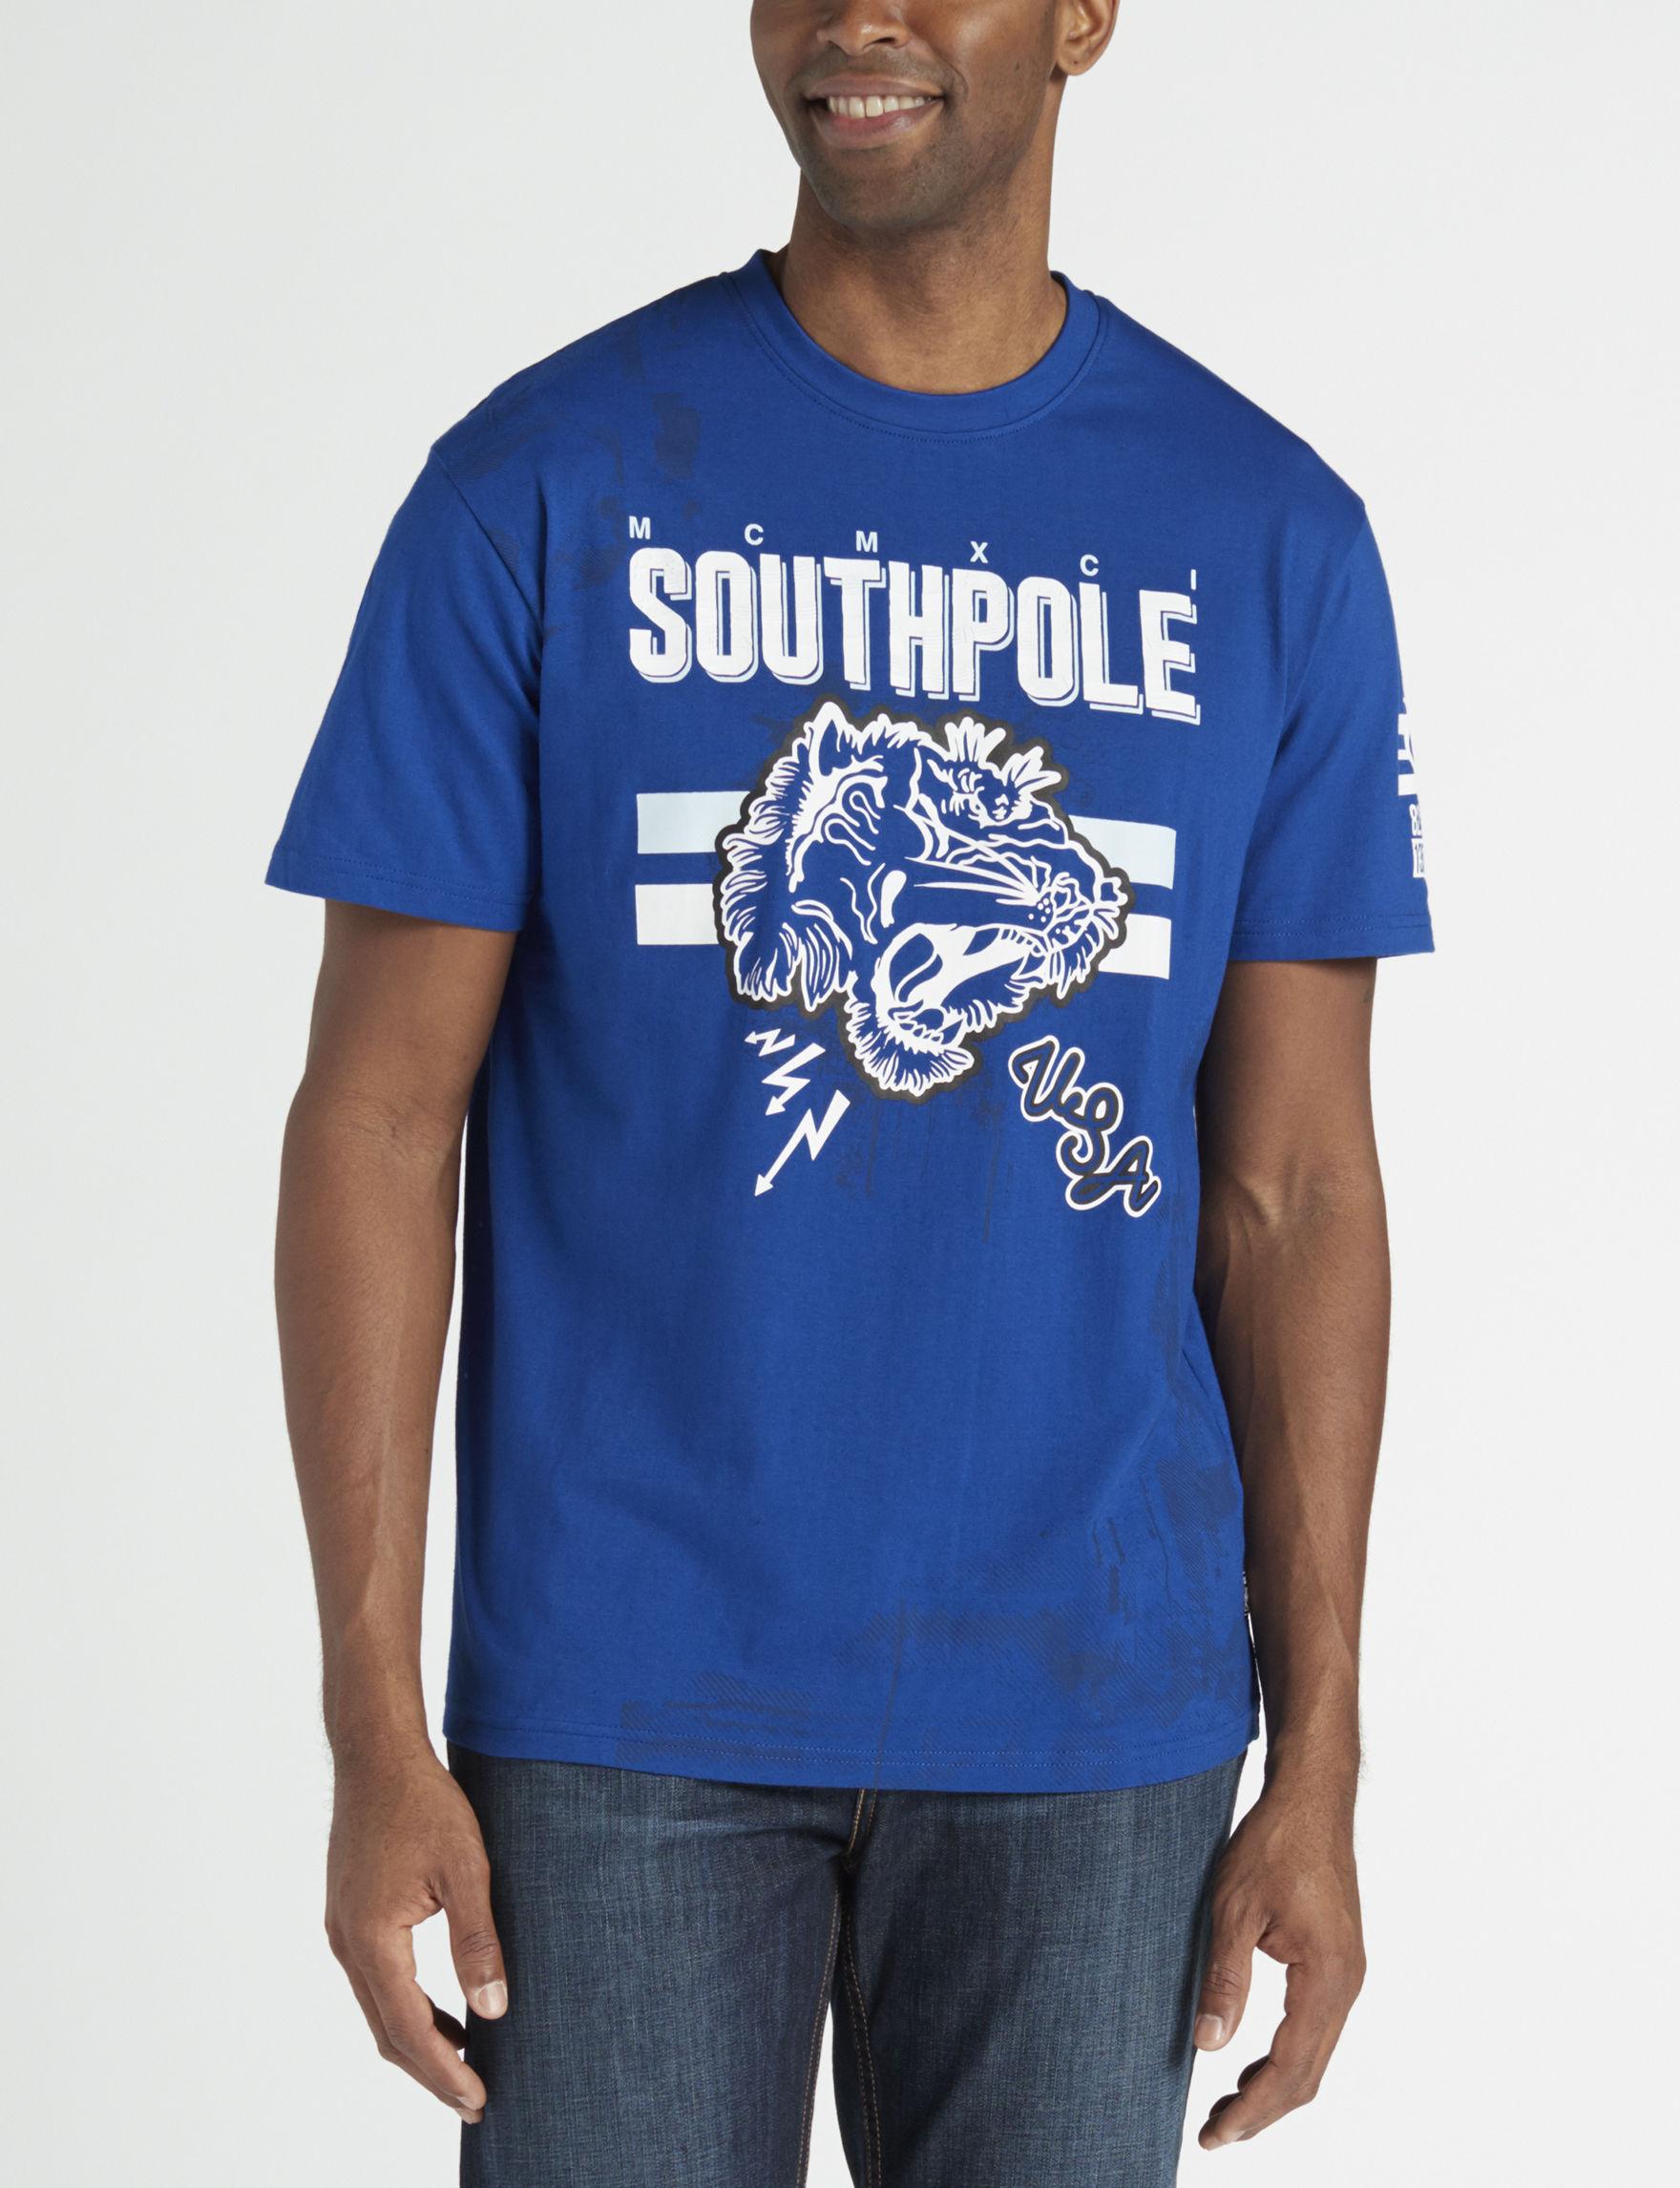 Southpole Royal Blue Tees & Tanks